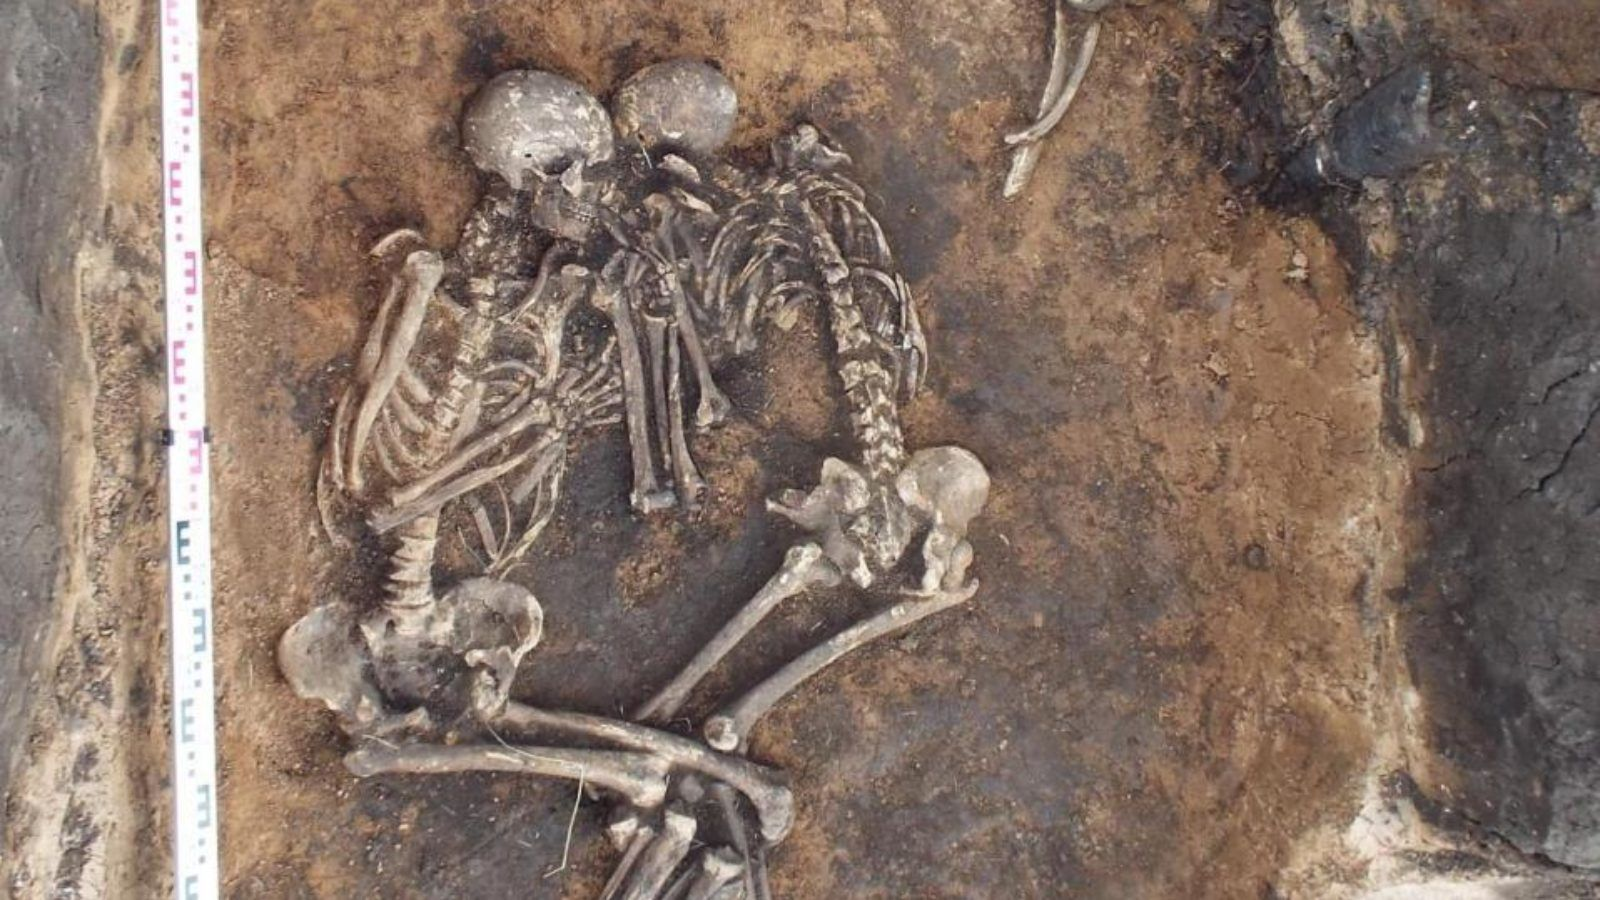 Ancestor of Bubonic plague found in 3,800 year-old teeth